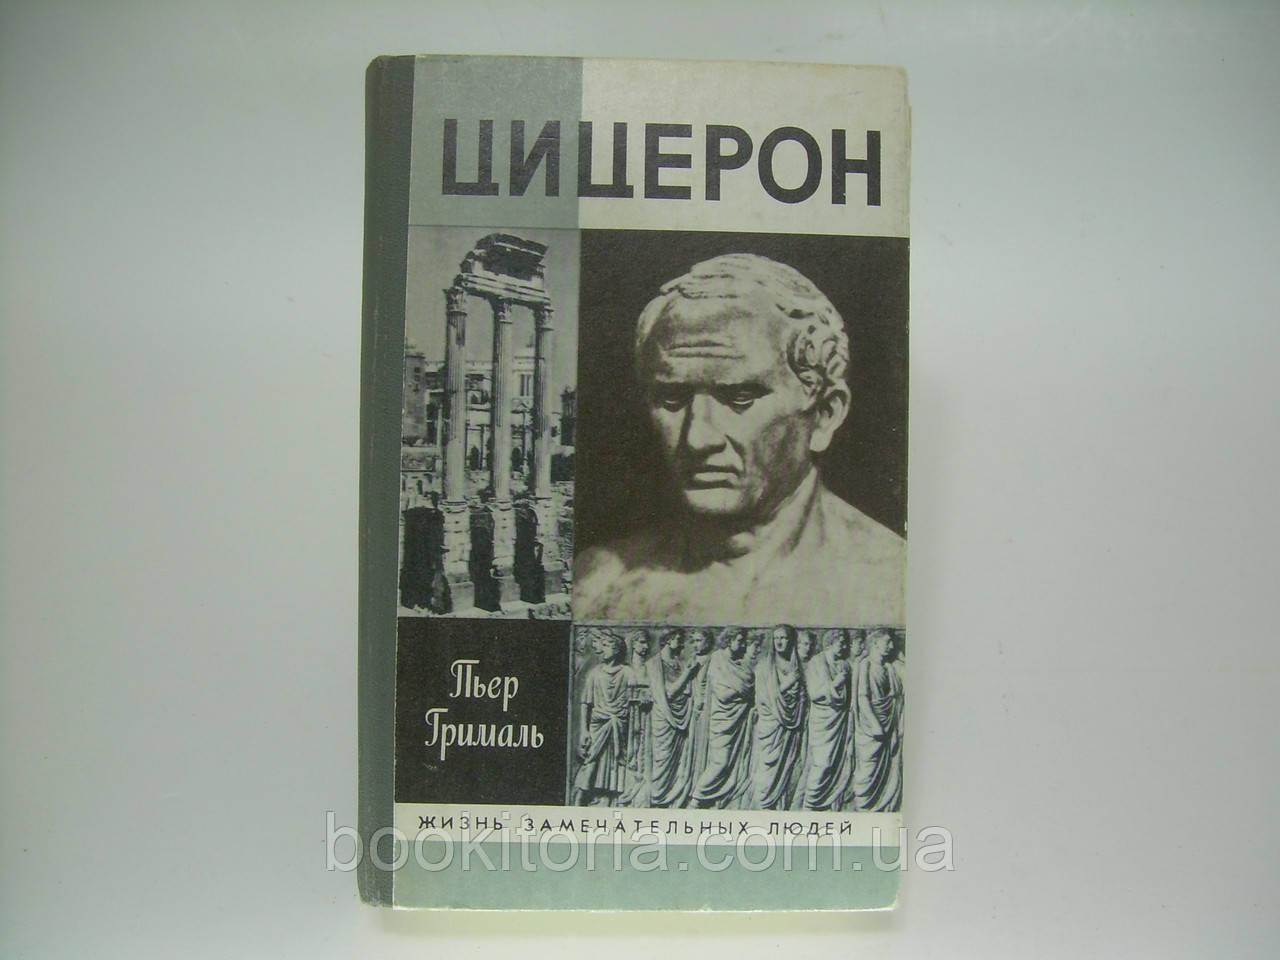 Грималь П. Цицерон (б/у).